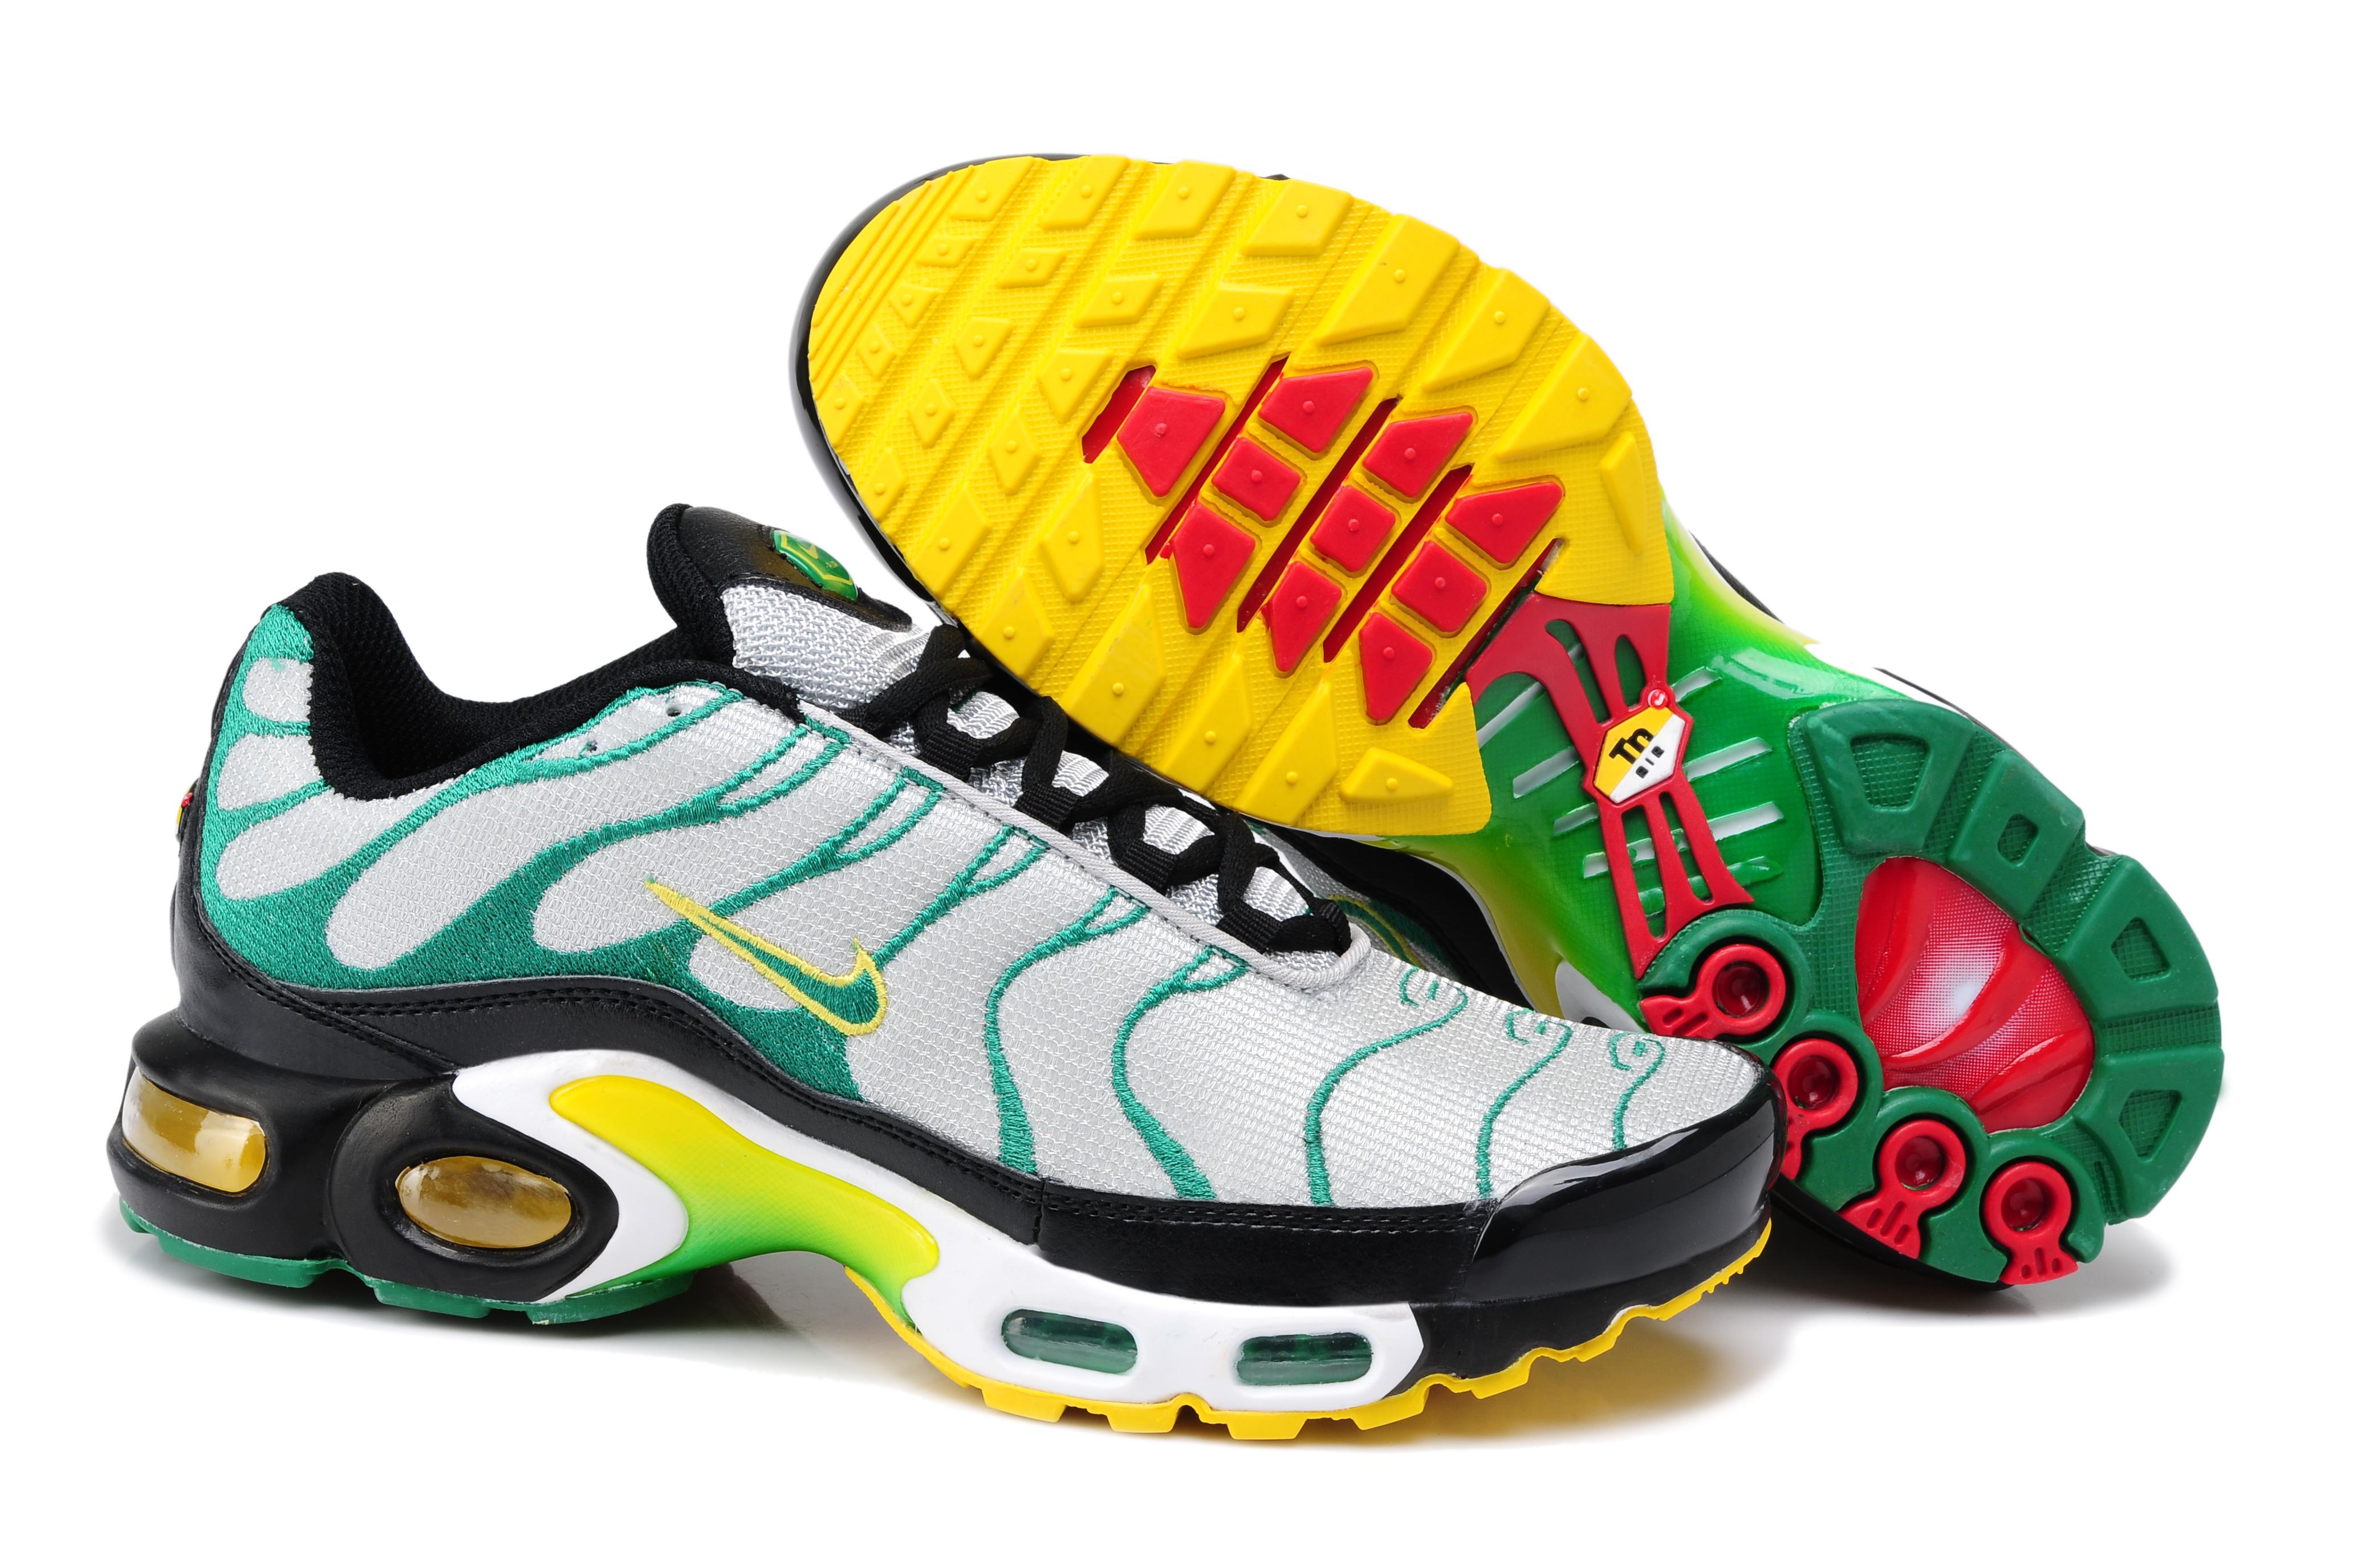 Nike Air Max Tn RequinNike Tuned 2014 Chaussures de